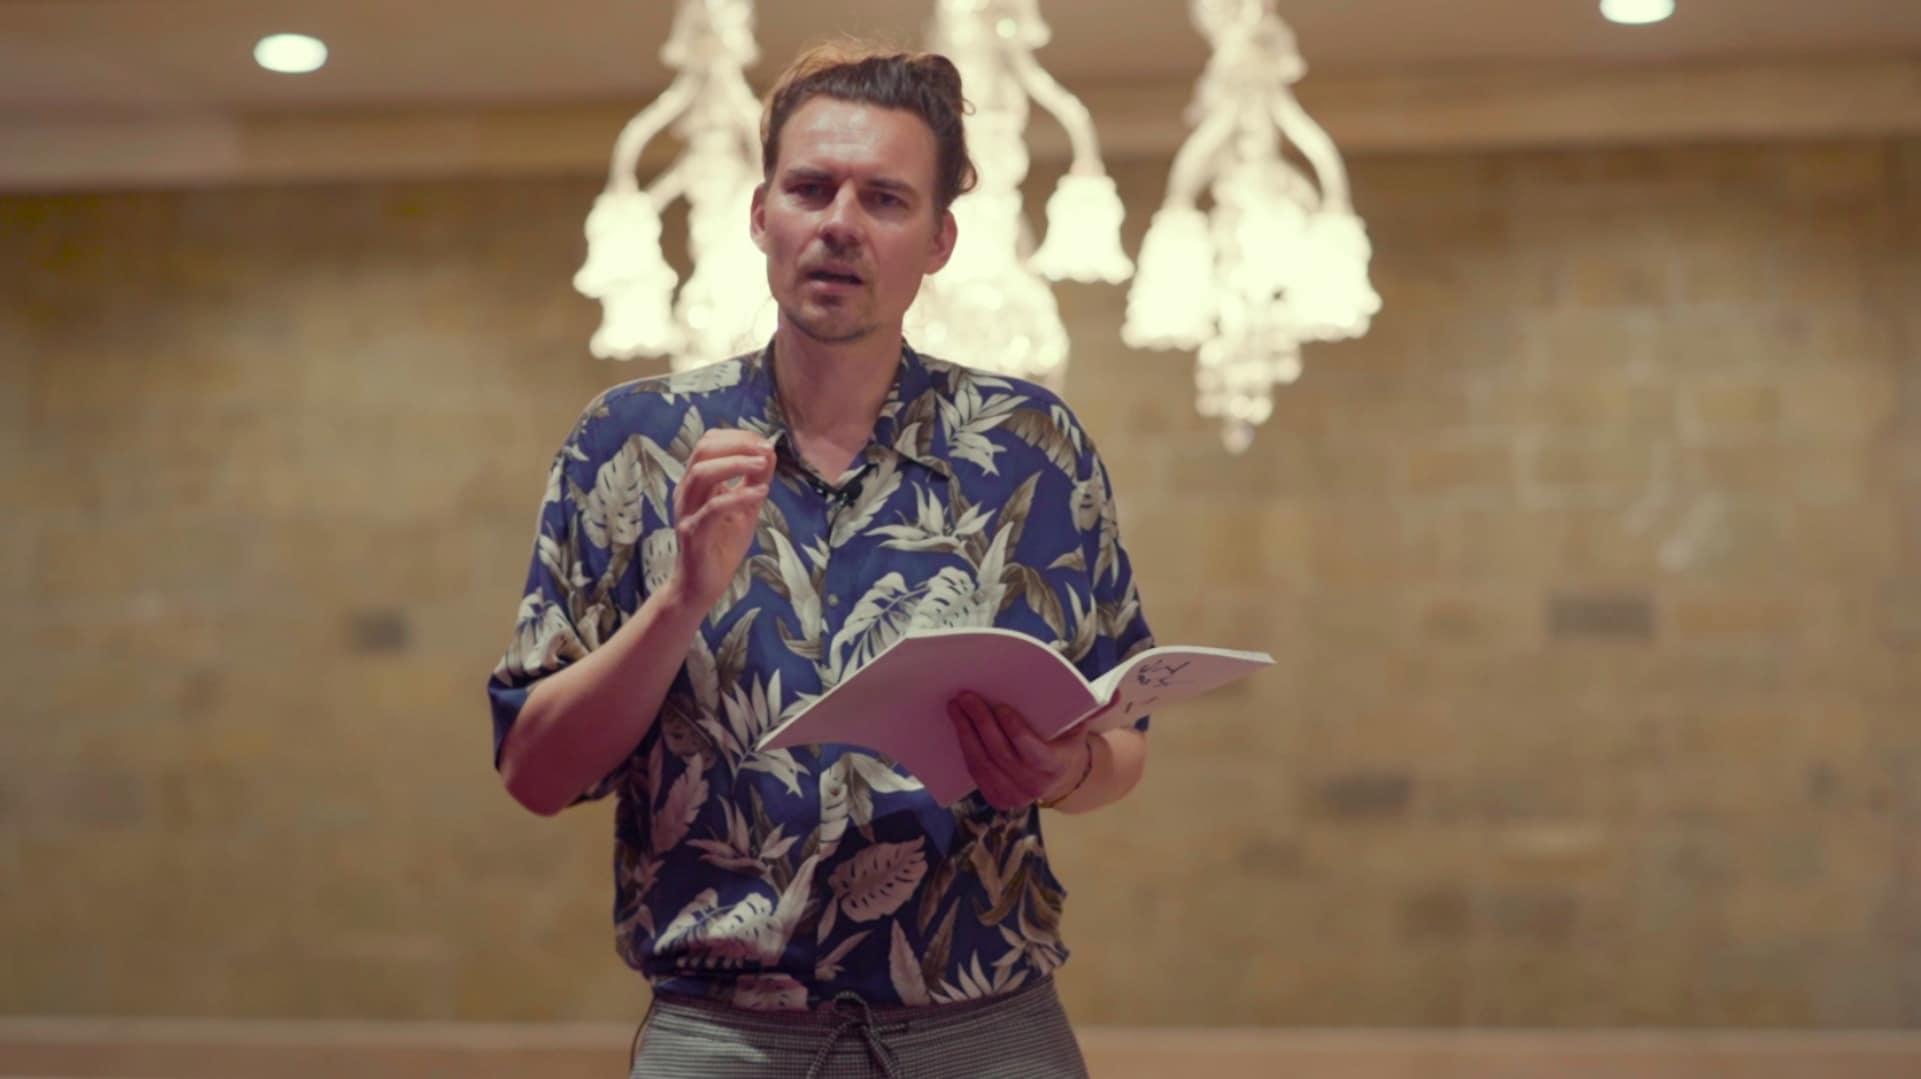 Watch: Spoken word poet Jurczok 1001's verses take on the media, politics and fake news